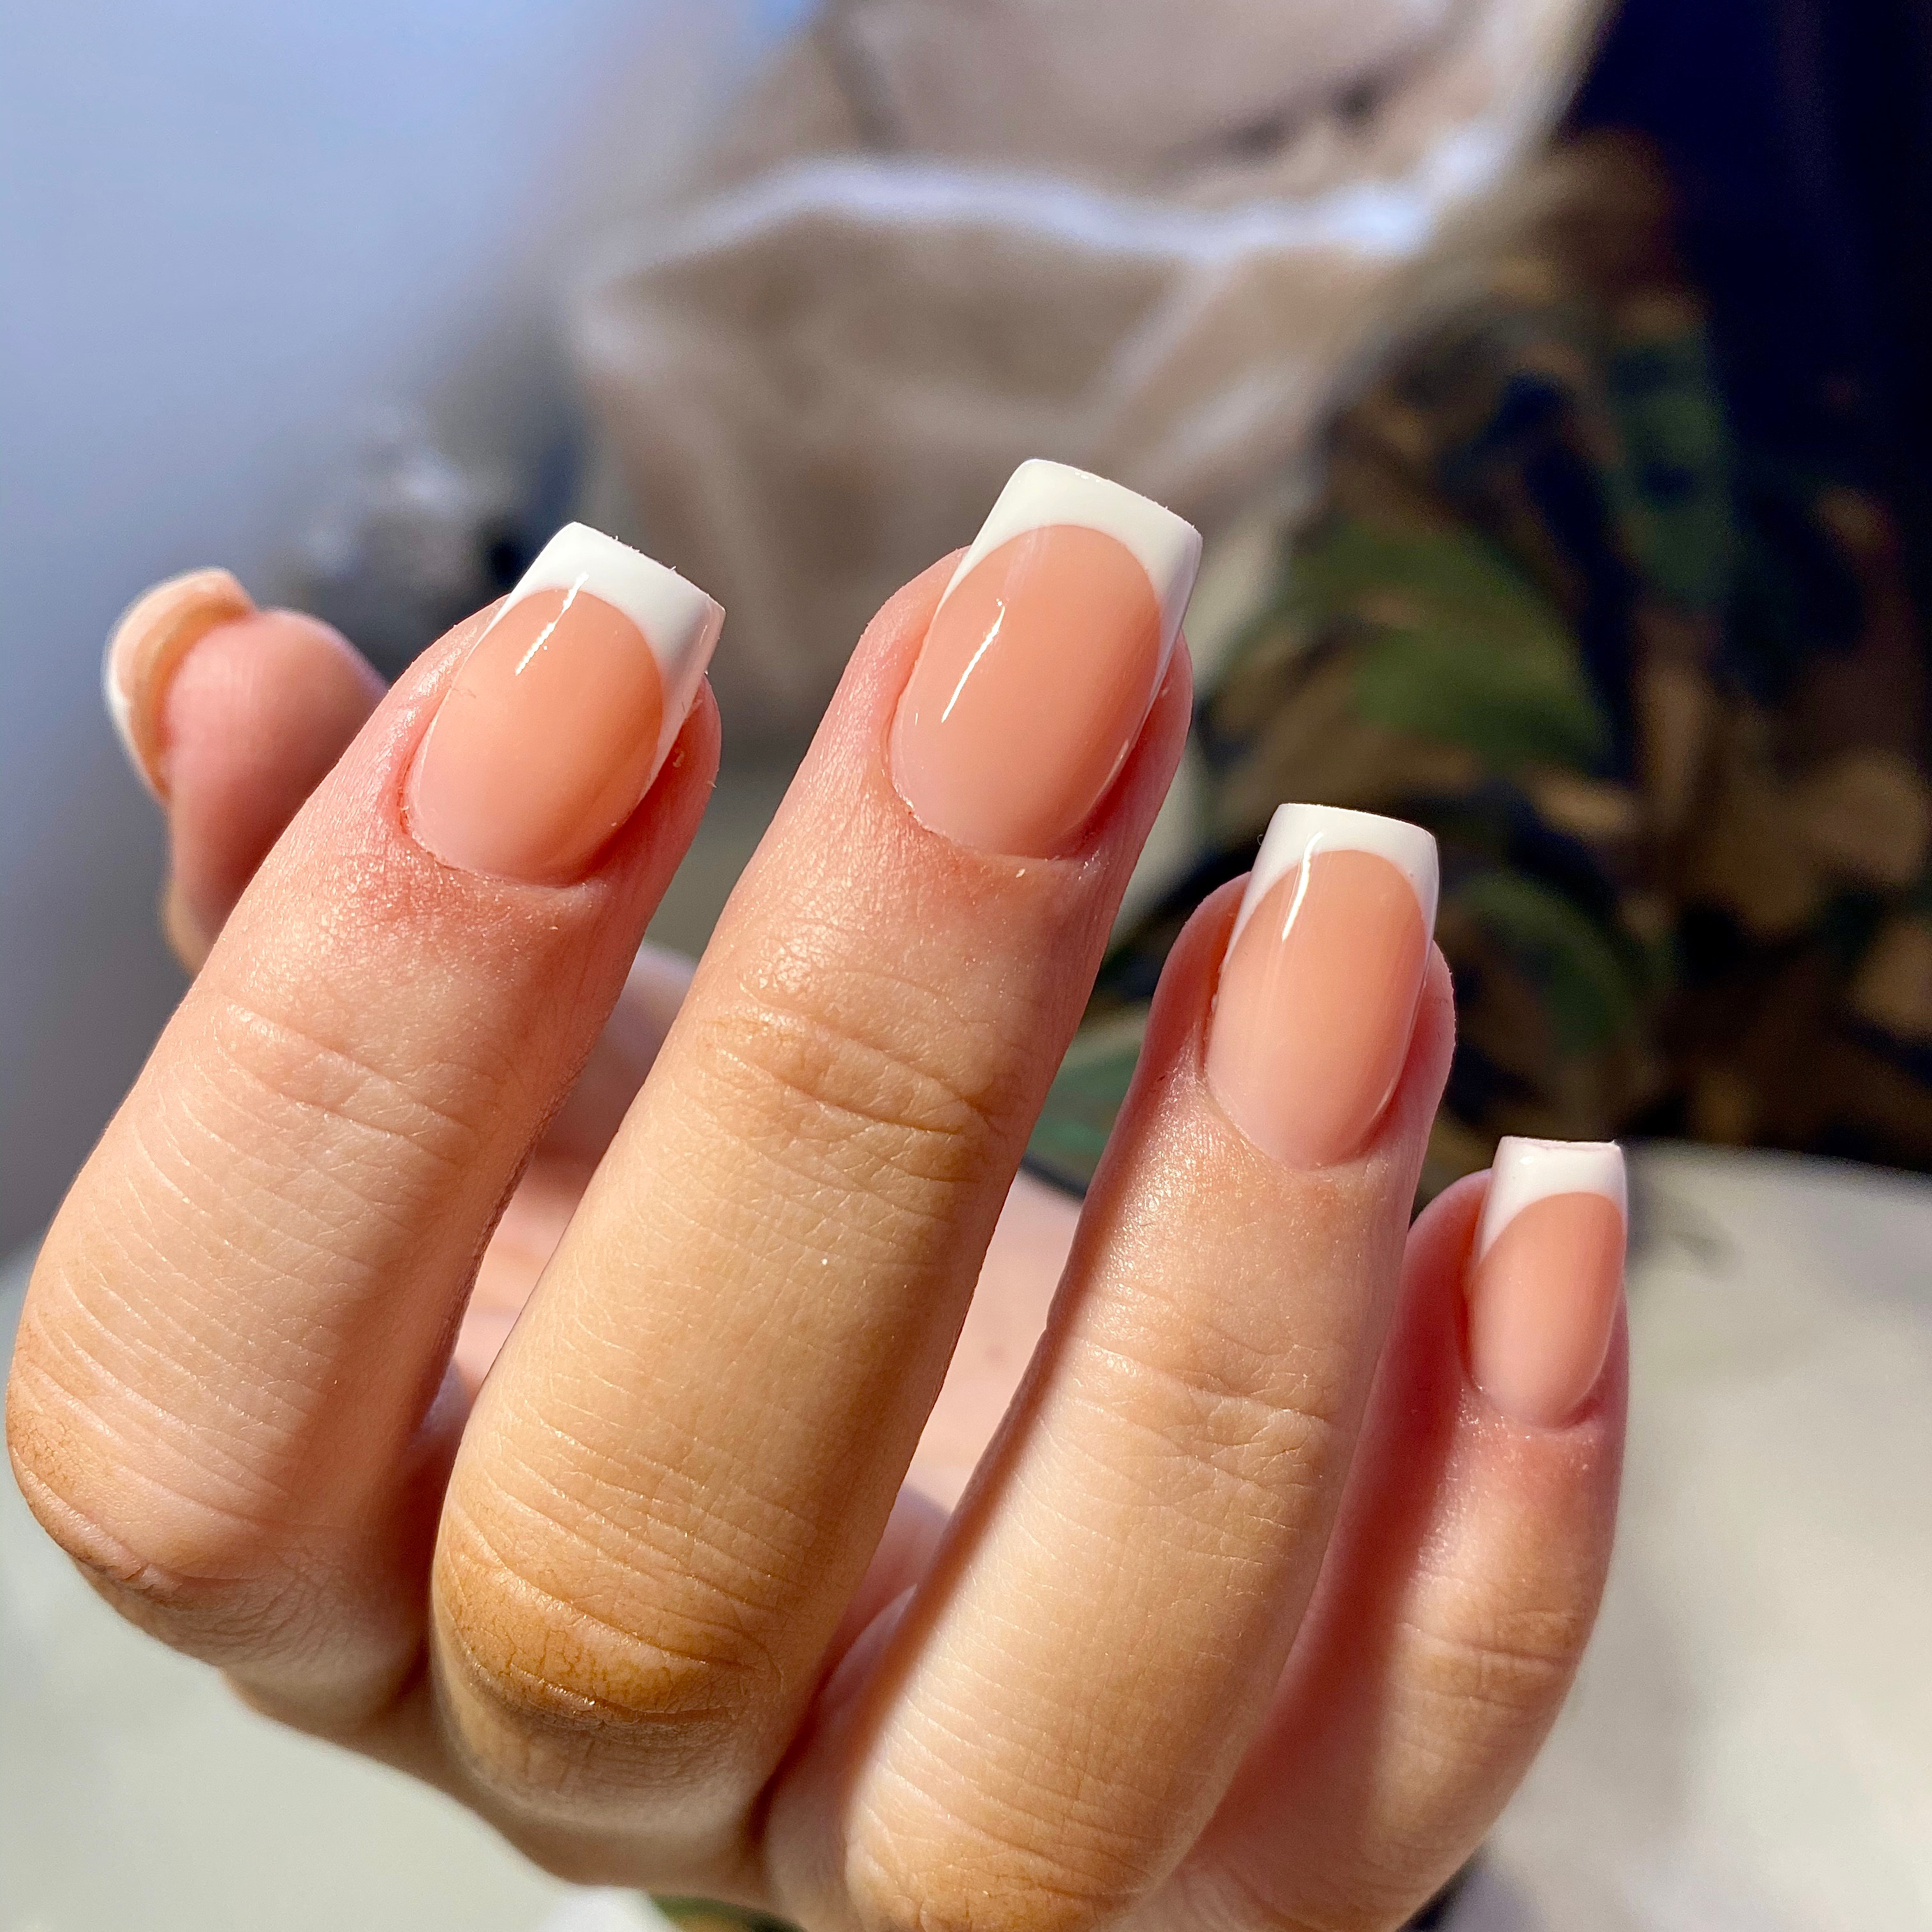 Gel Polish Manicure and Pedicure